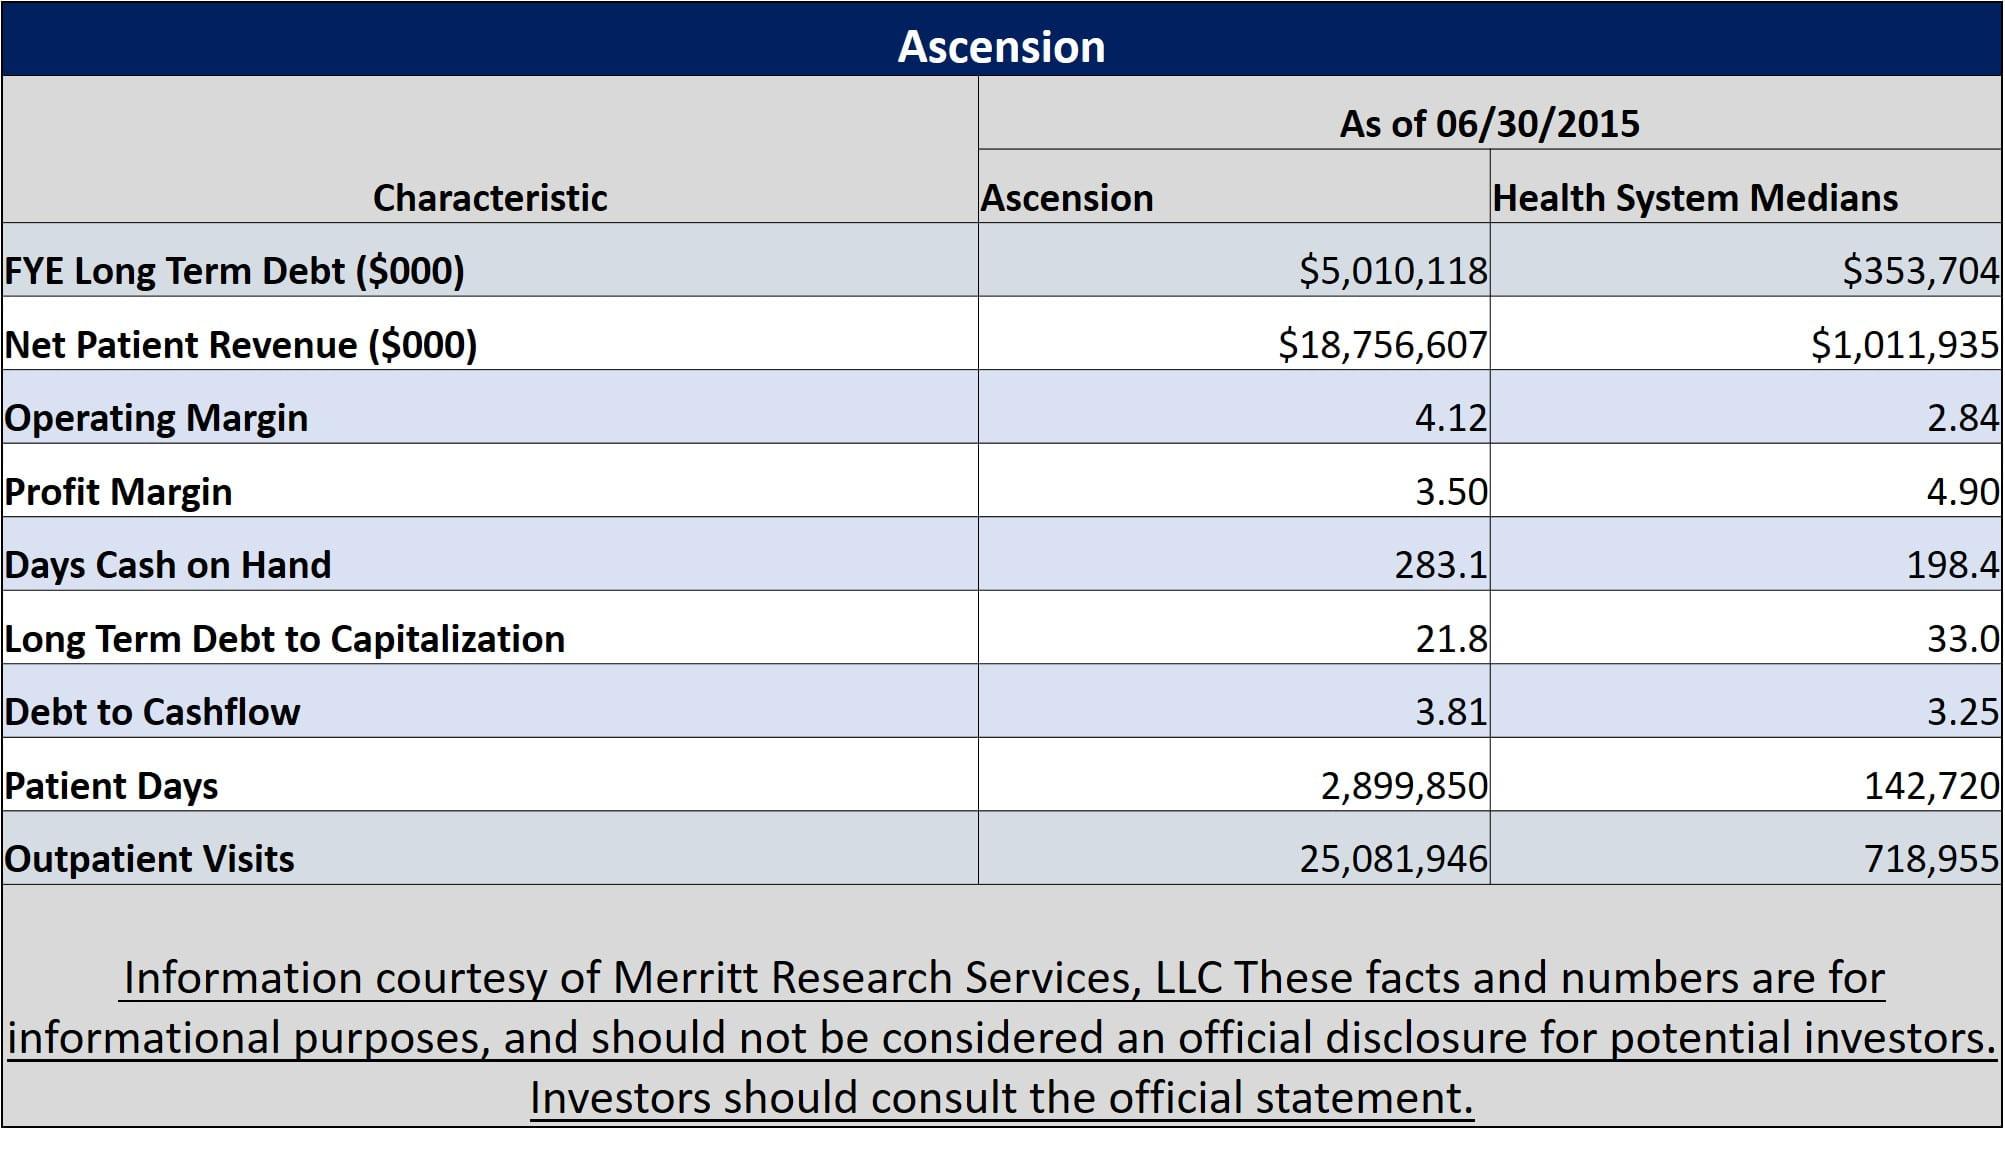 Municipal Bond Featured Snapshot - Ascension Health